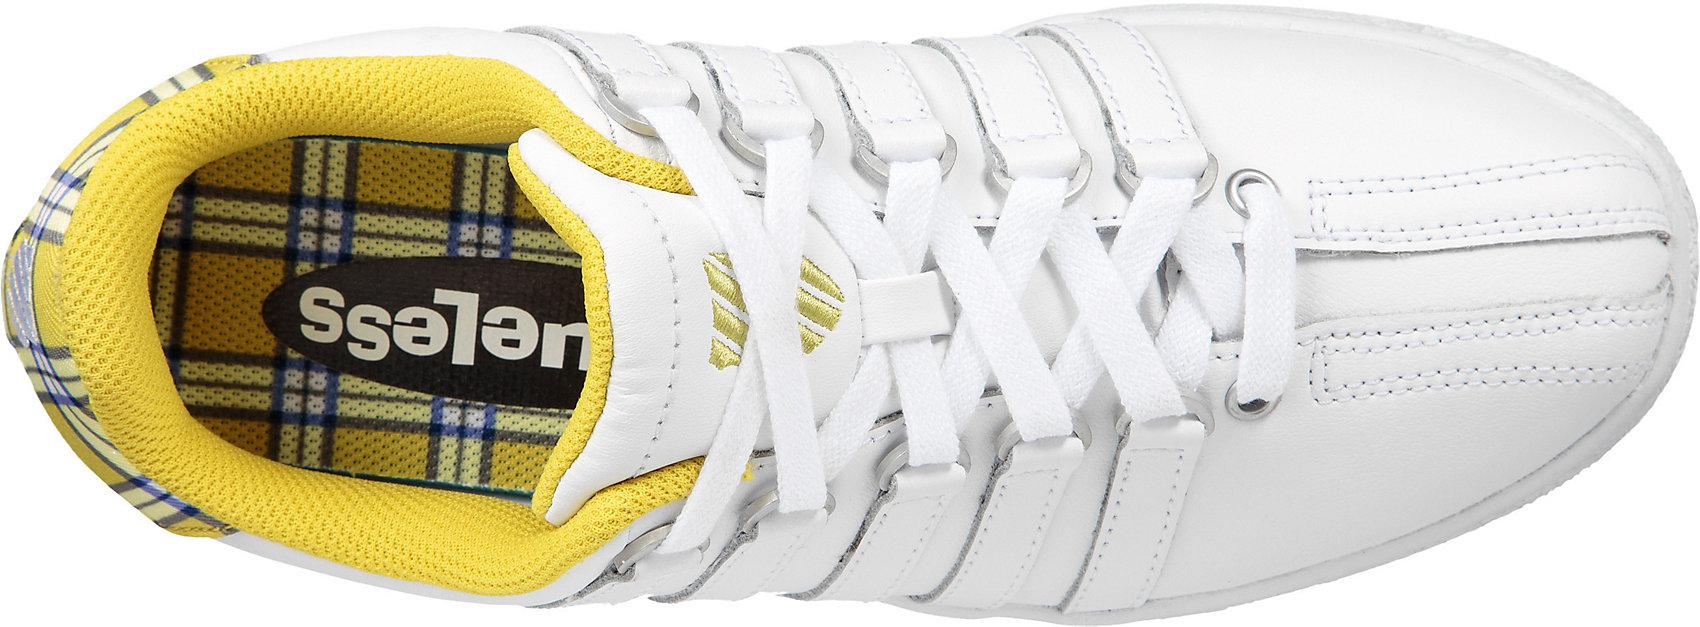 Neu K-SWISS CLASSIC VN CLUELESS Sneakers Low 11427479 weiß